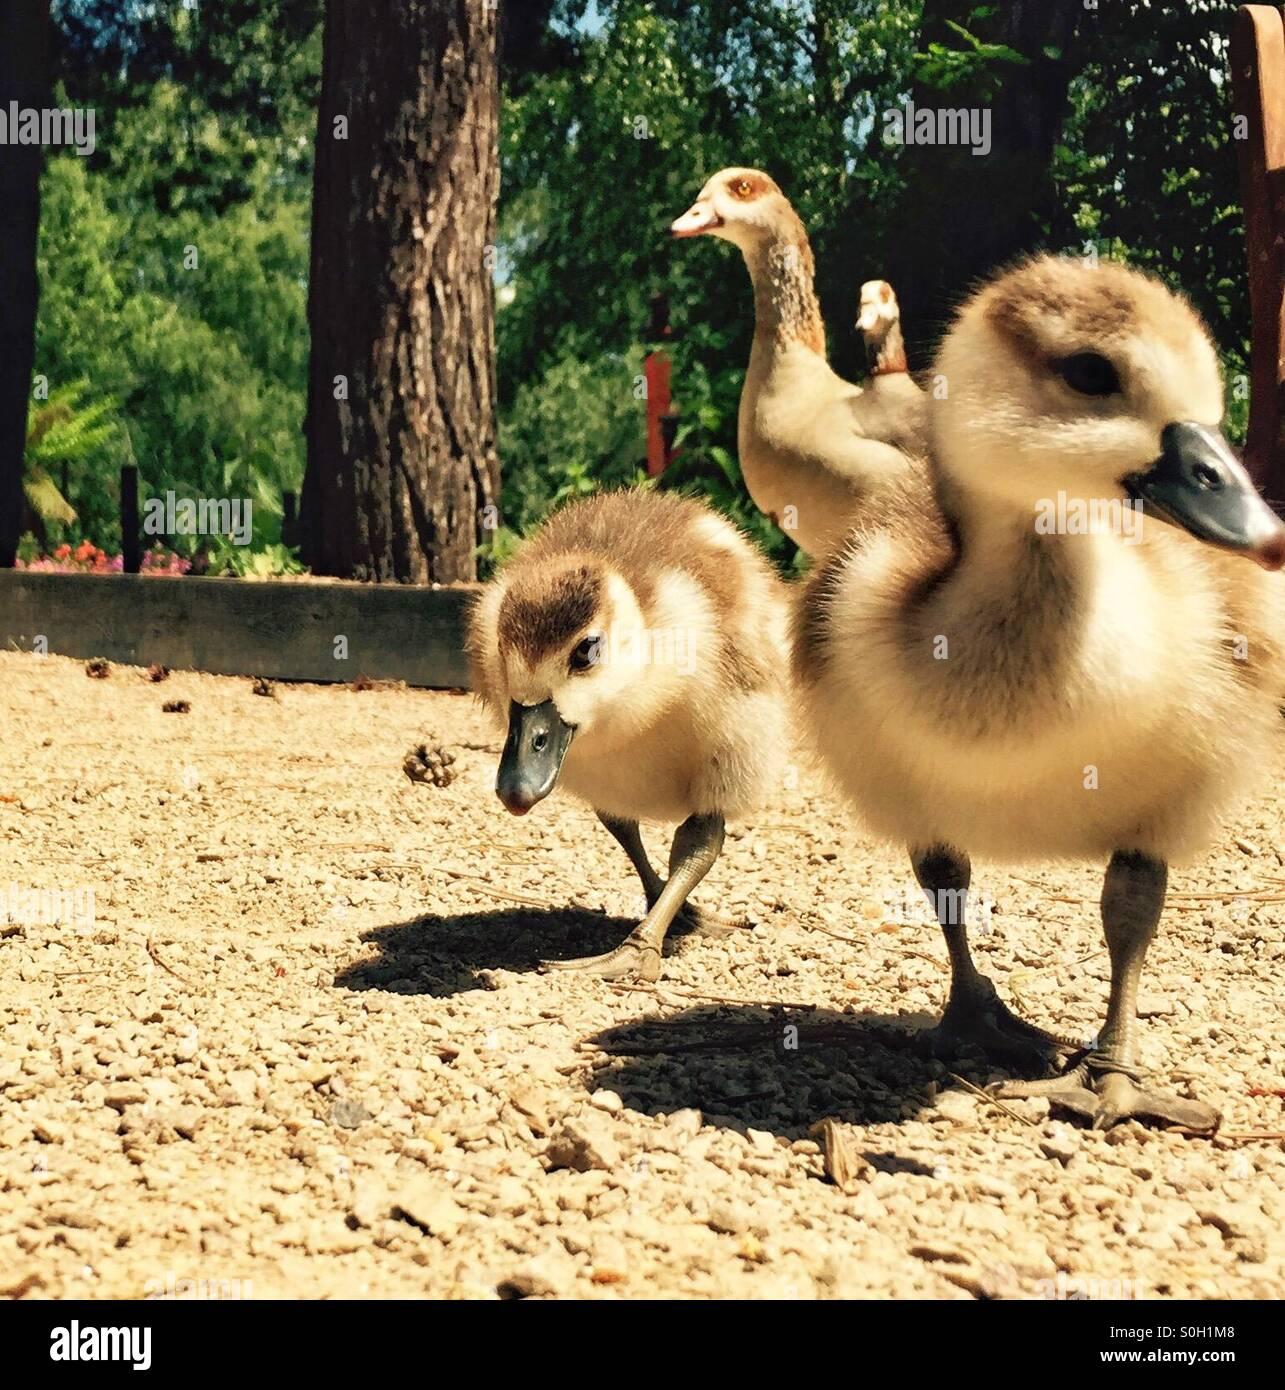 Baby chicks - Stock Image